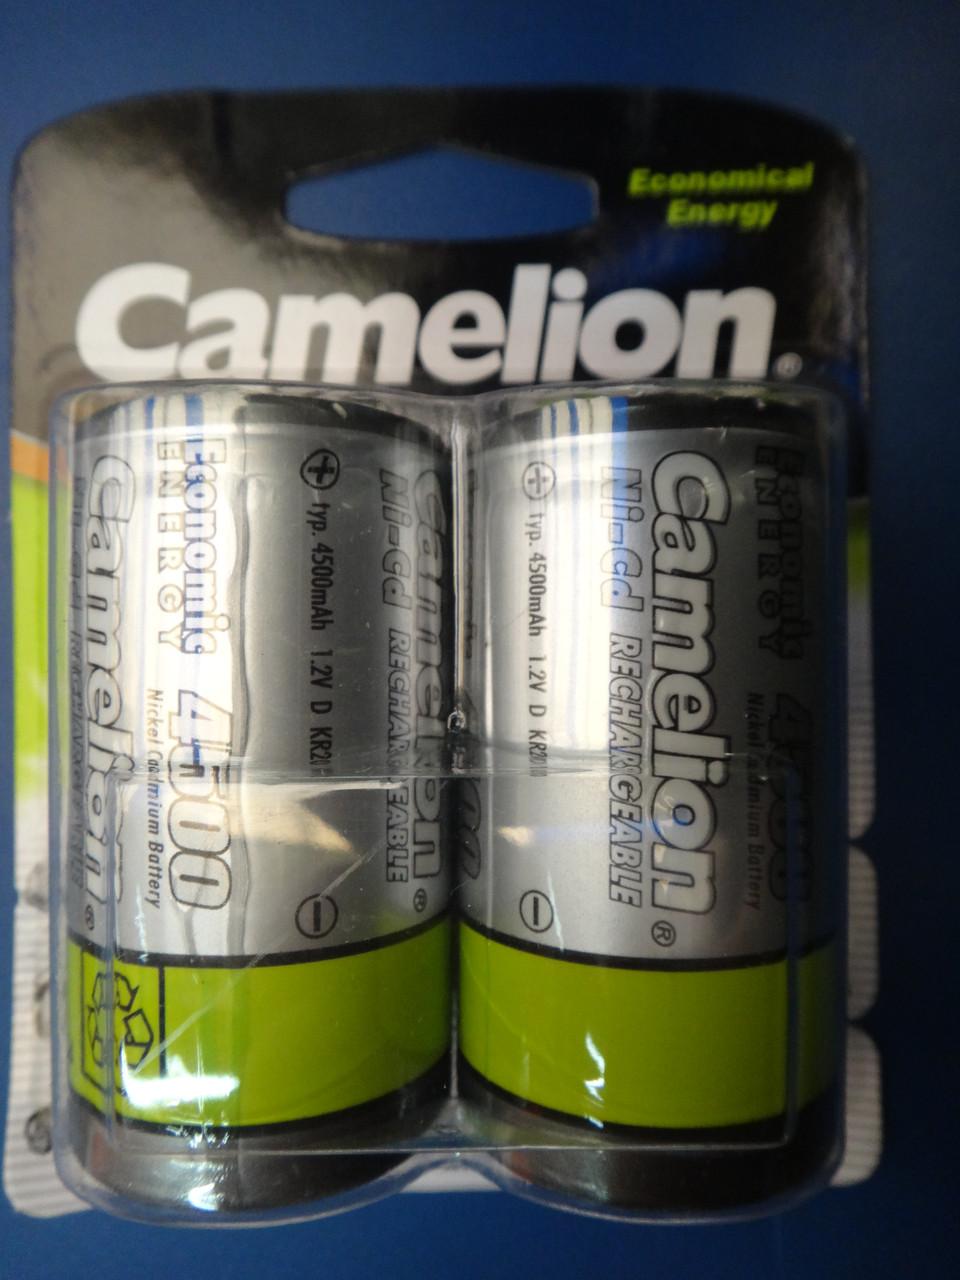 Аккумулятор Camelion D20 4500mAh 1.2V Ni-MH R20